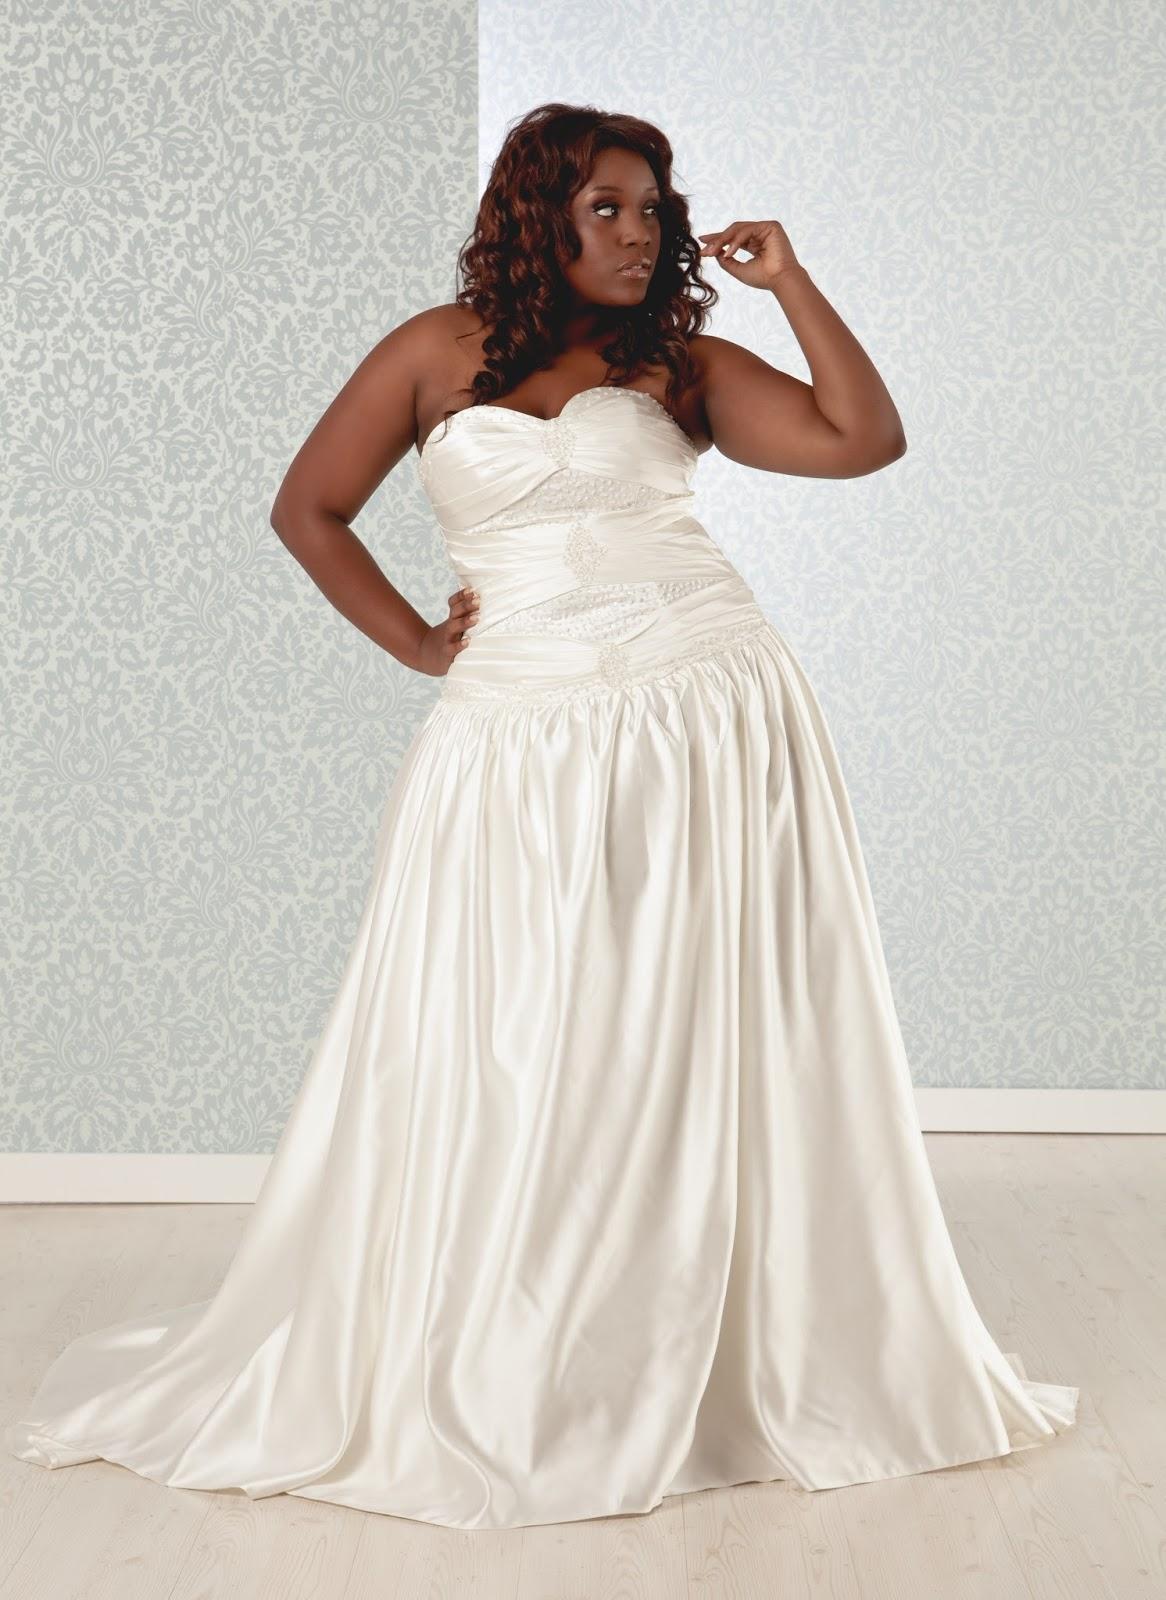 plus size wedding gowns full figure plus size wedding gowns Plus size wedding gowns full figure